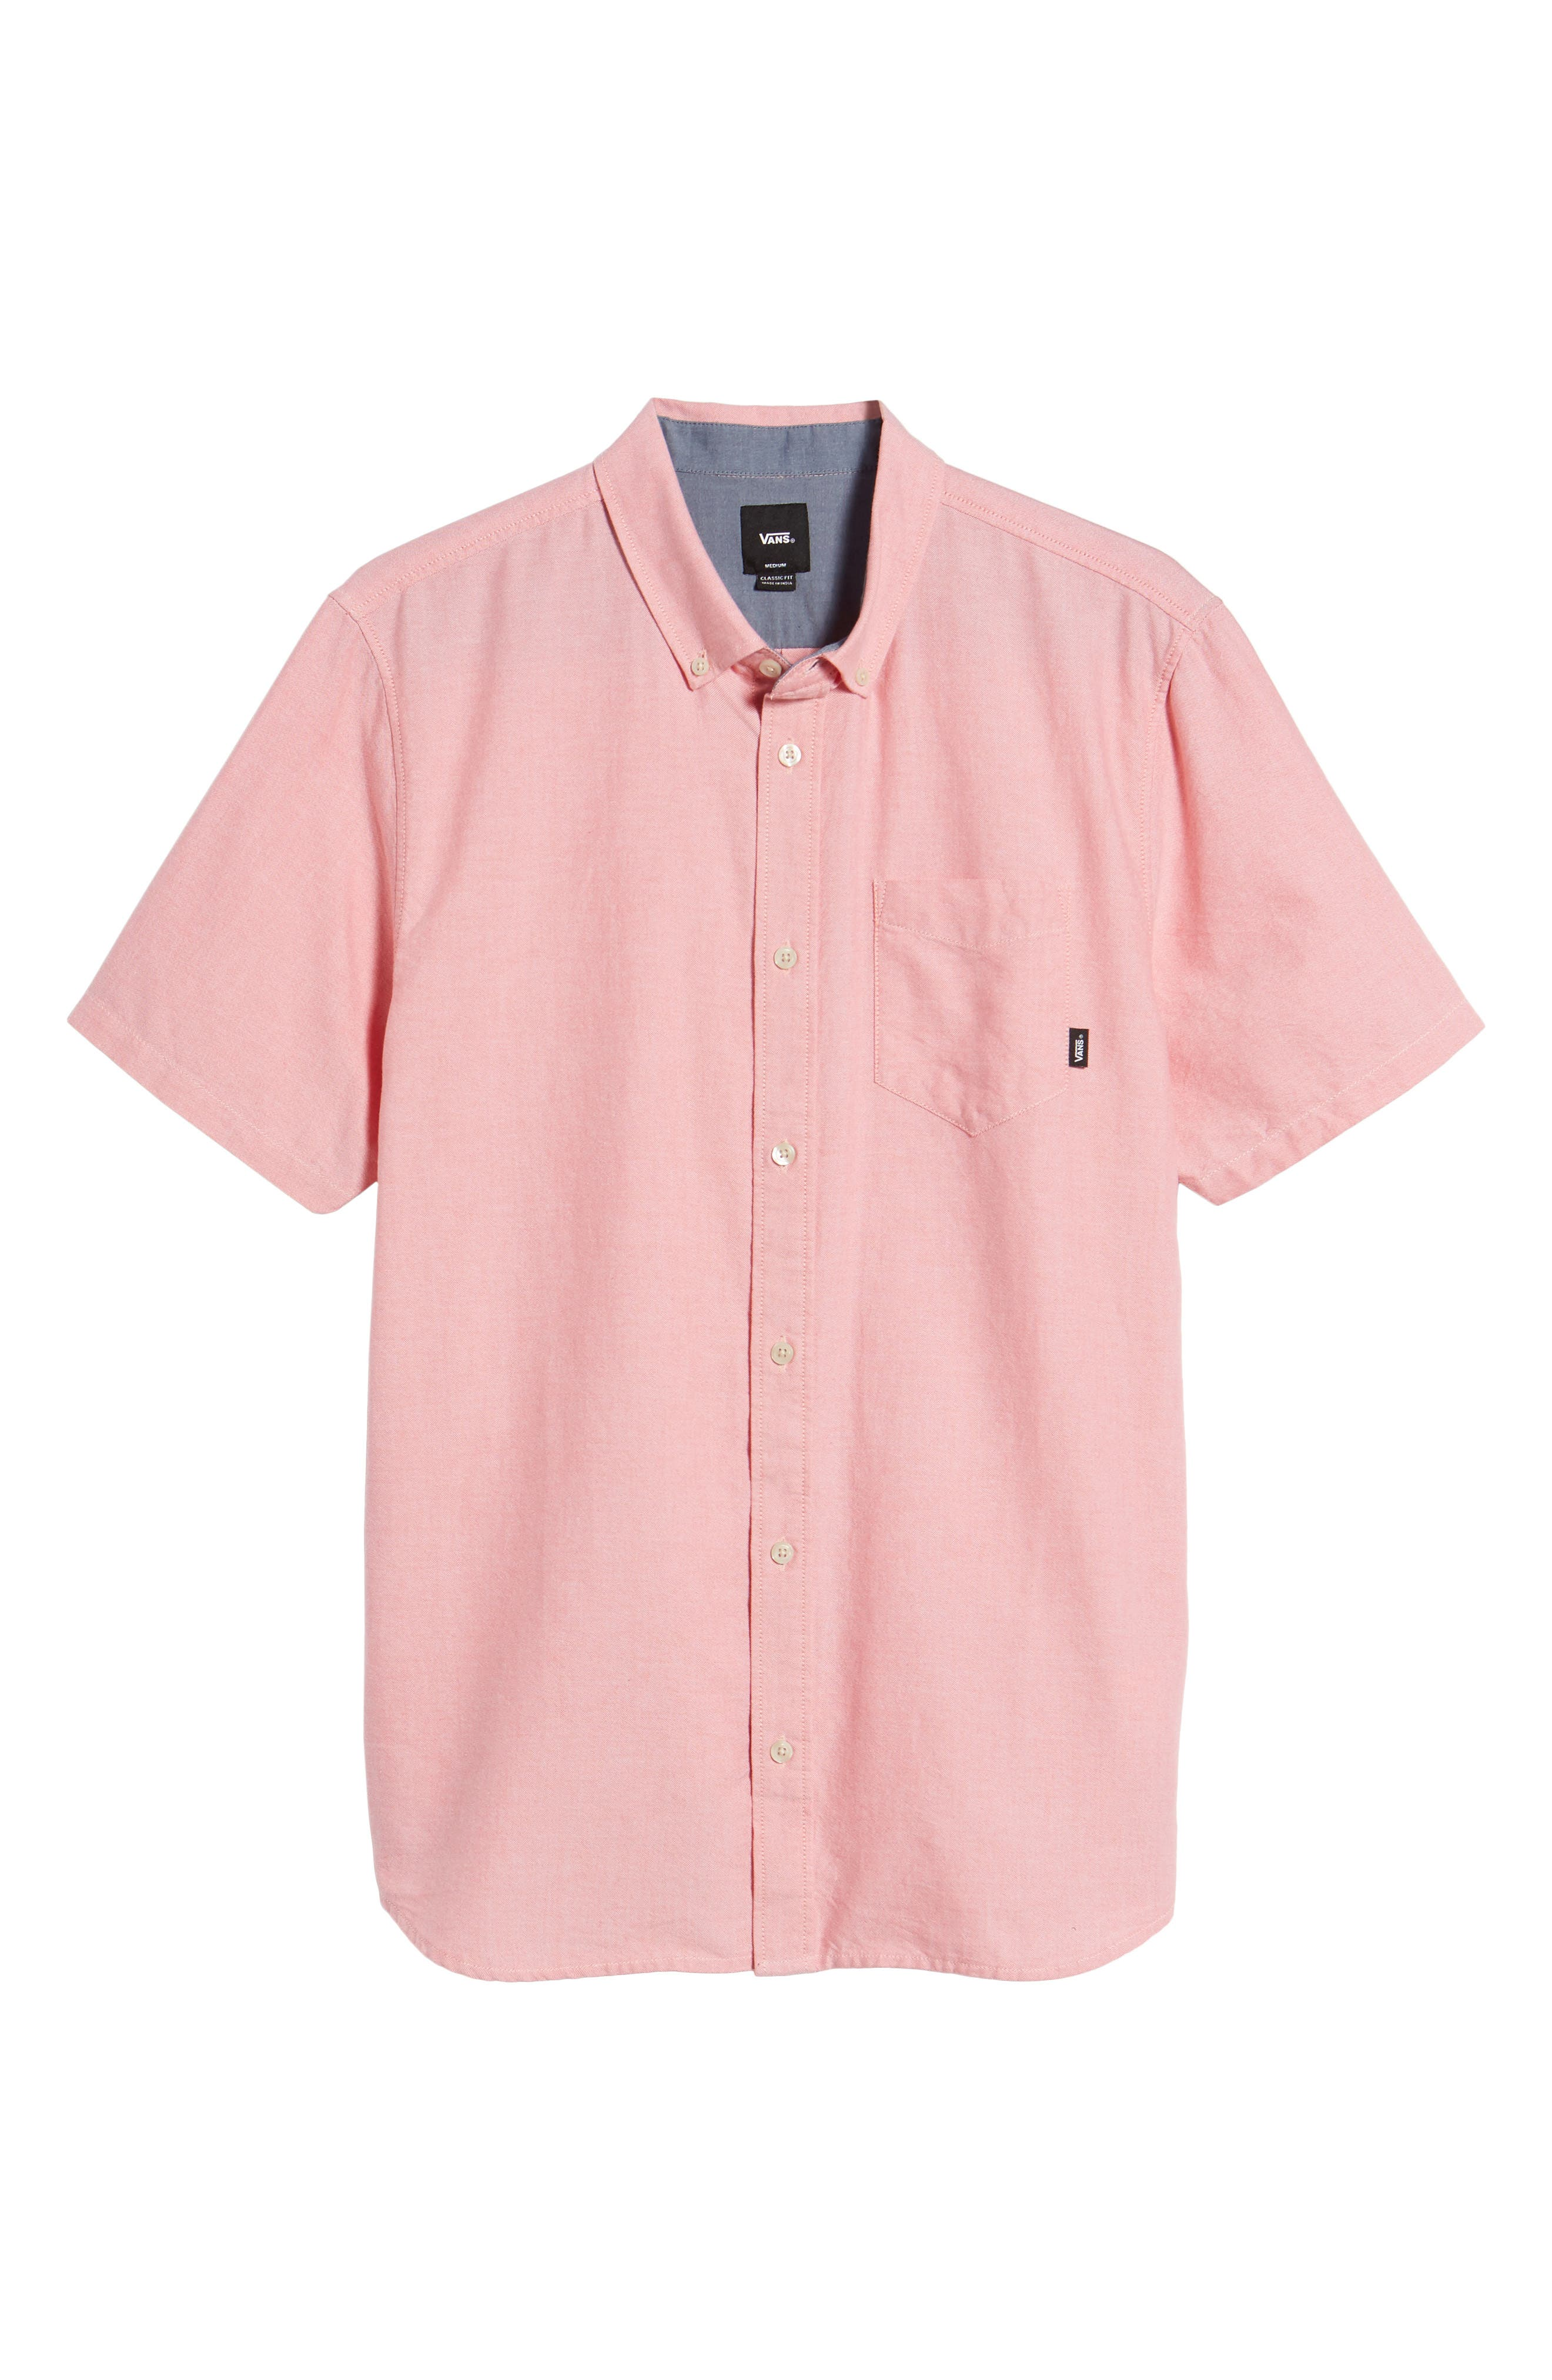 Houser Solid Woven Shirt,                             Alternate thumbnail 6, color,                             950